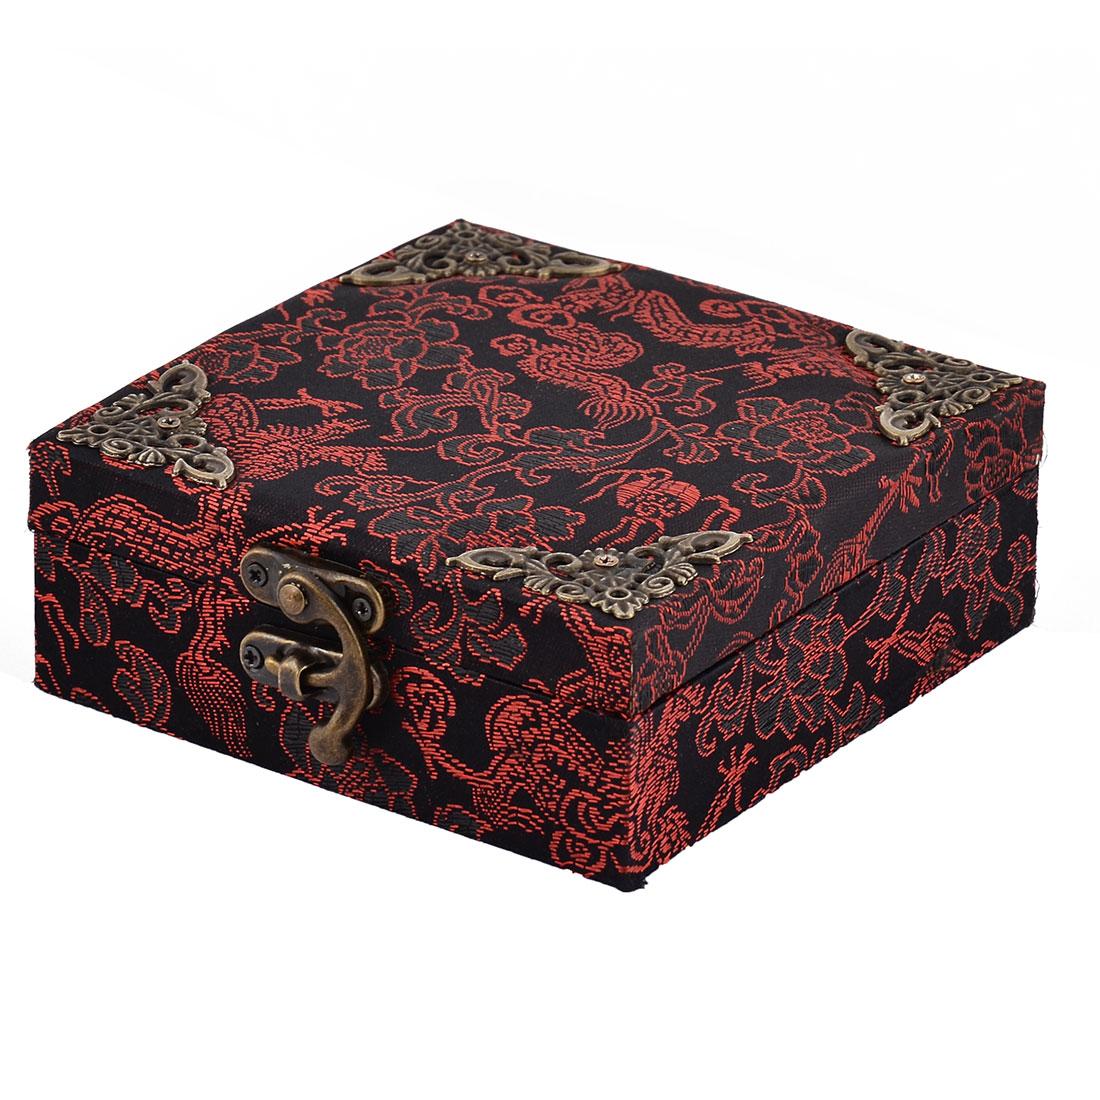 Travel Wood Flower Pattern Retro Style Jewelry Collection Locked Box Organizer